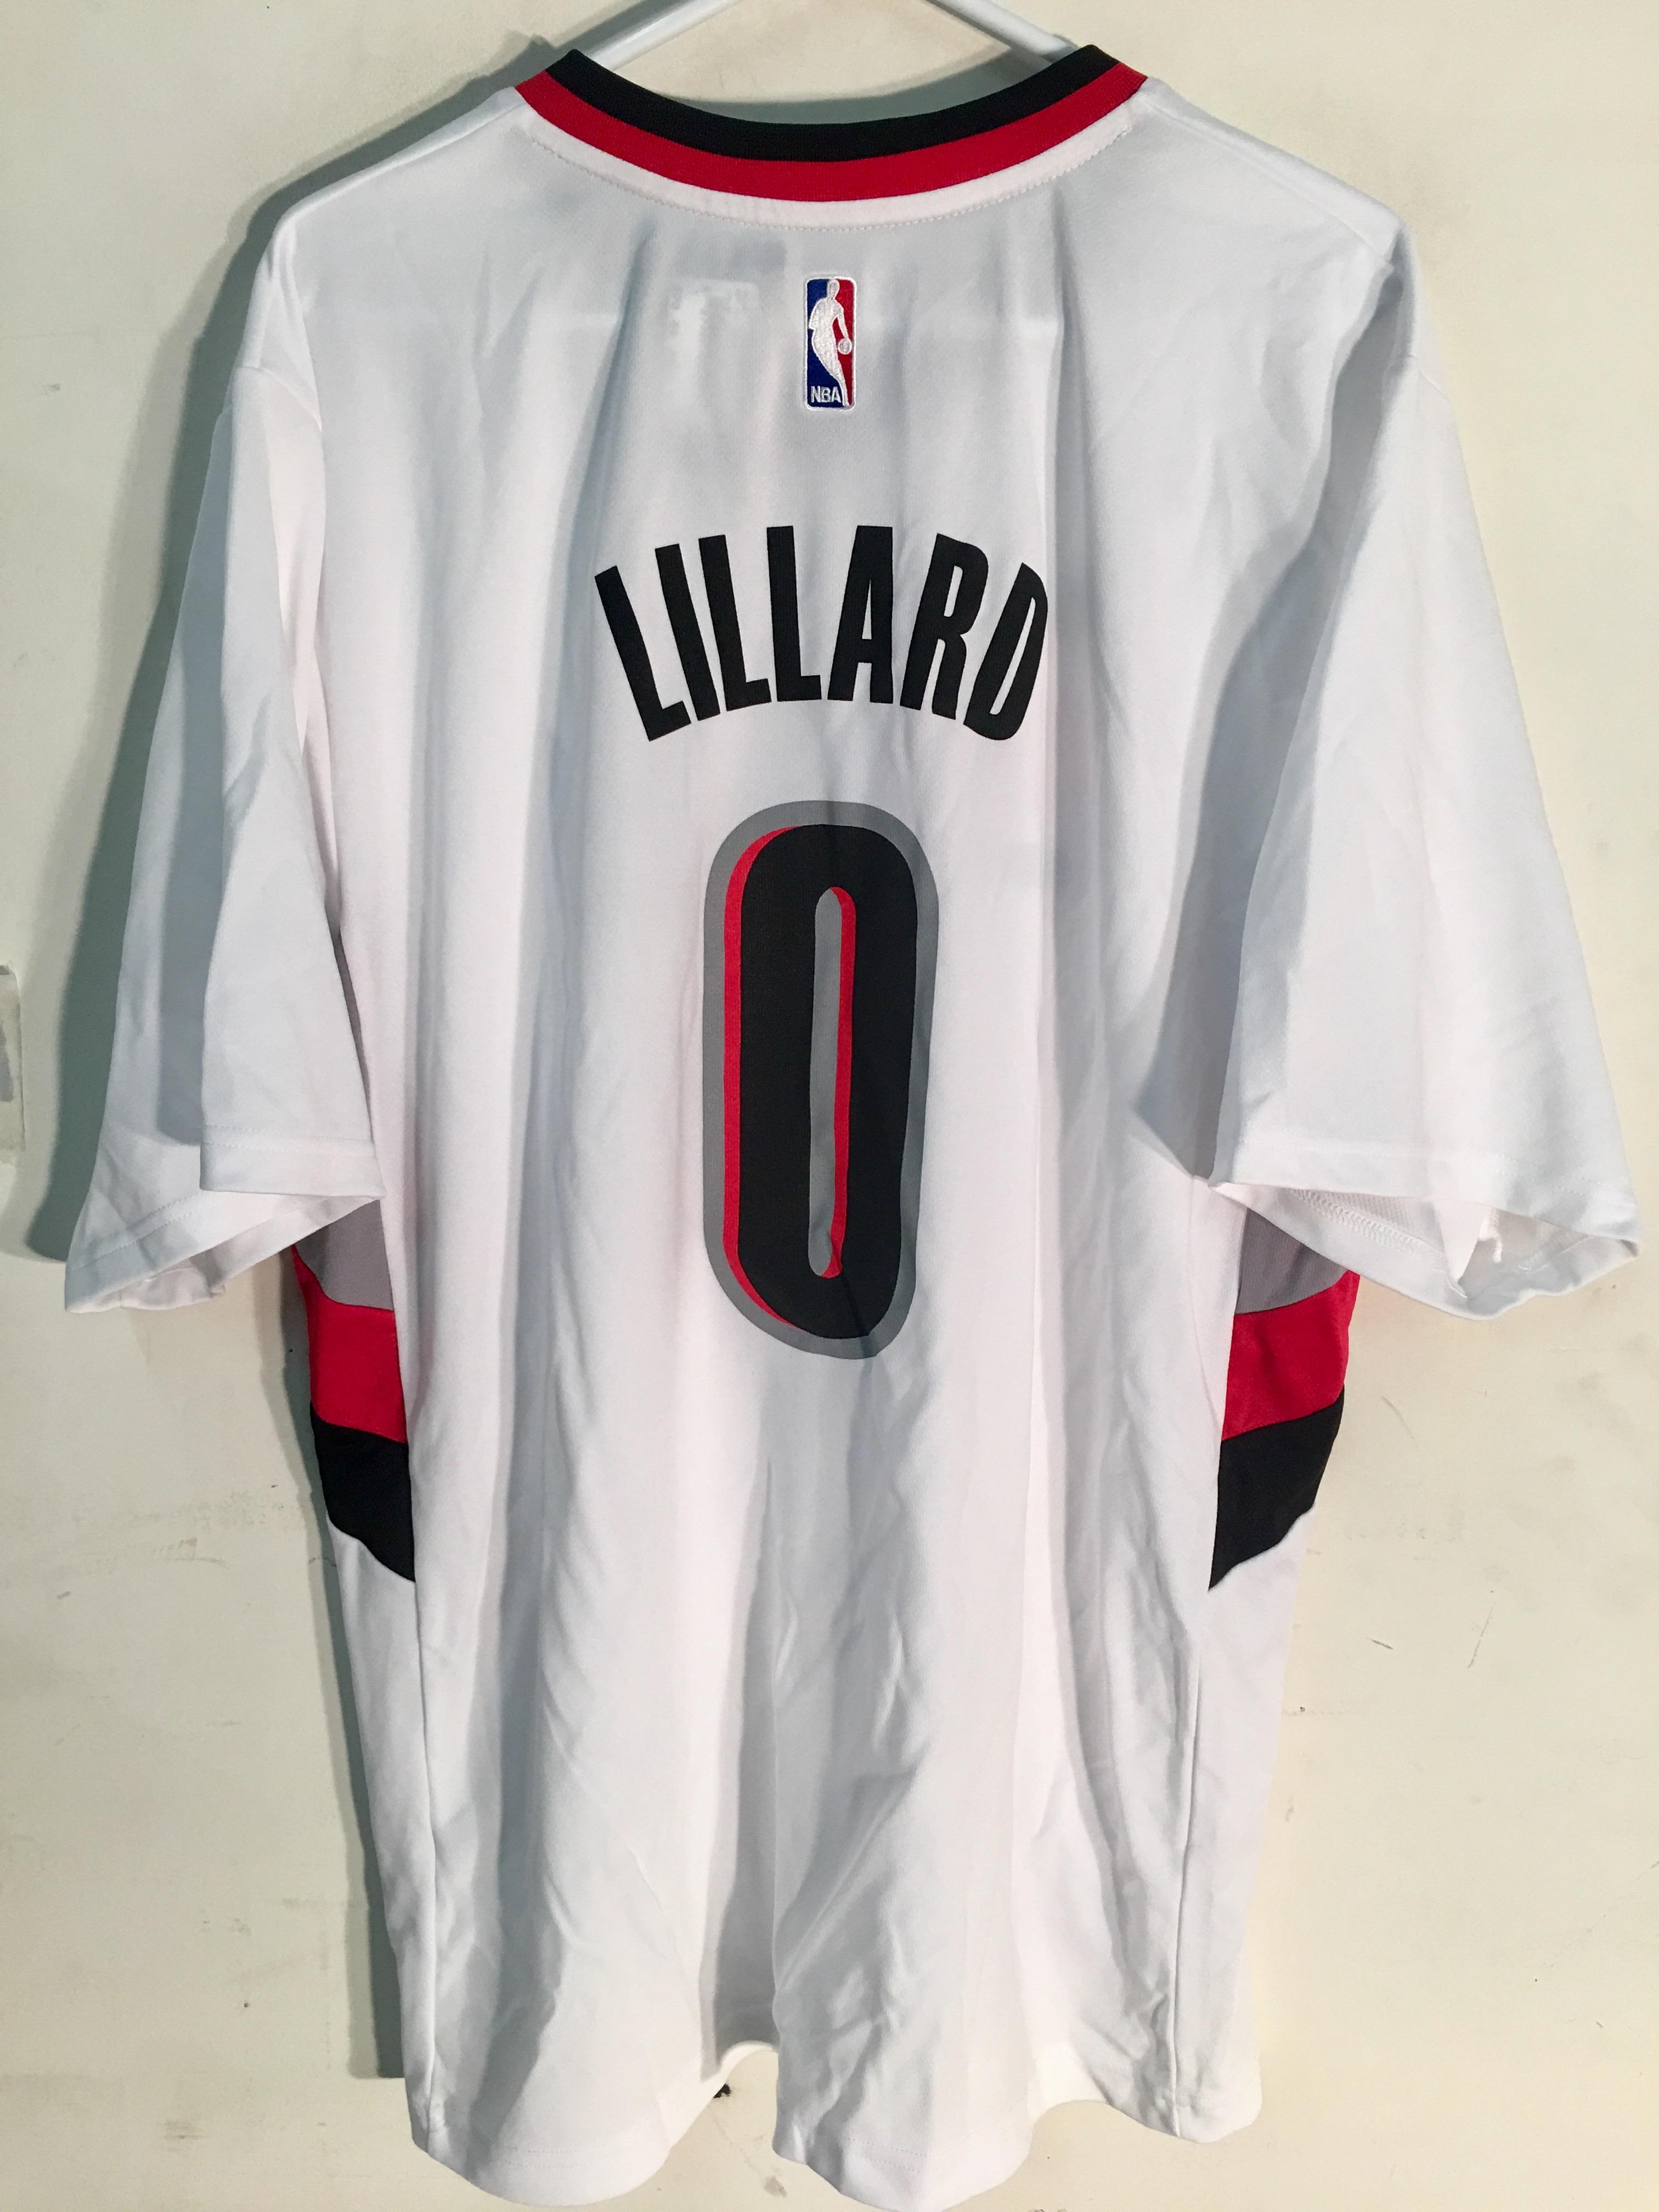 ba900b7e288 Details about Adidas NBA Jersey Portland Trailblazers Damian Lillard White  SS sz 2X